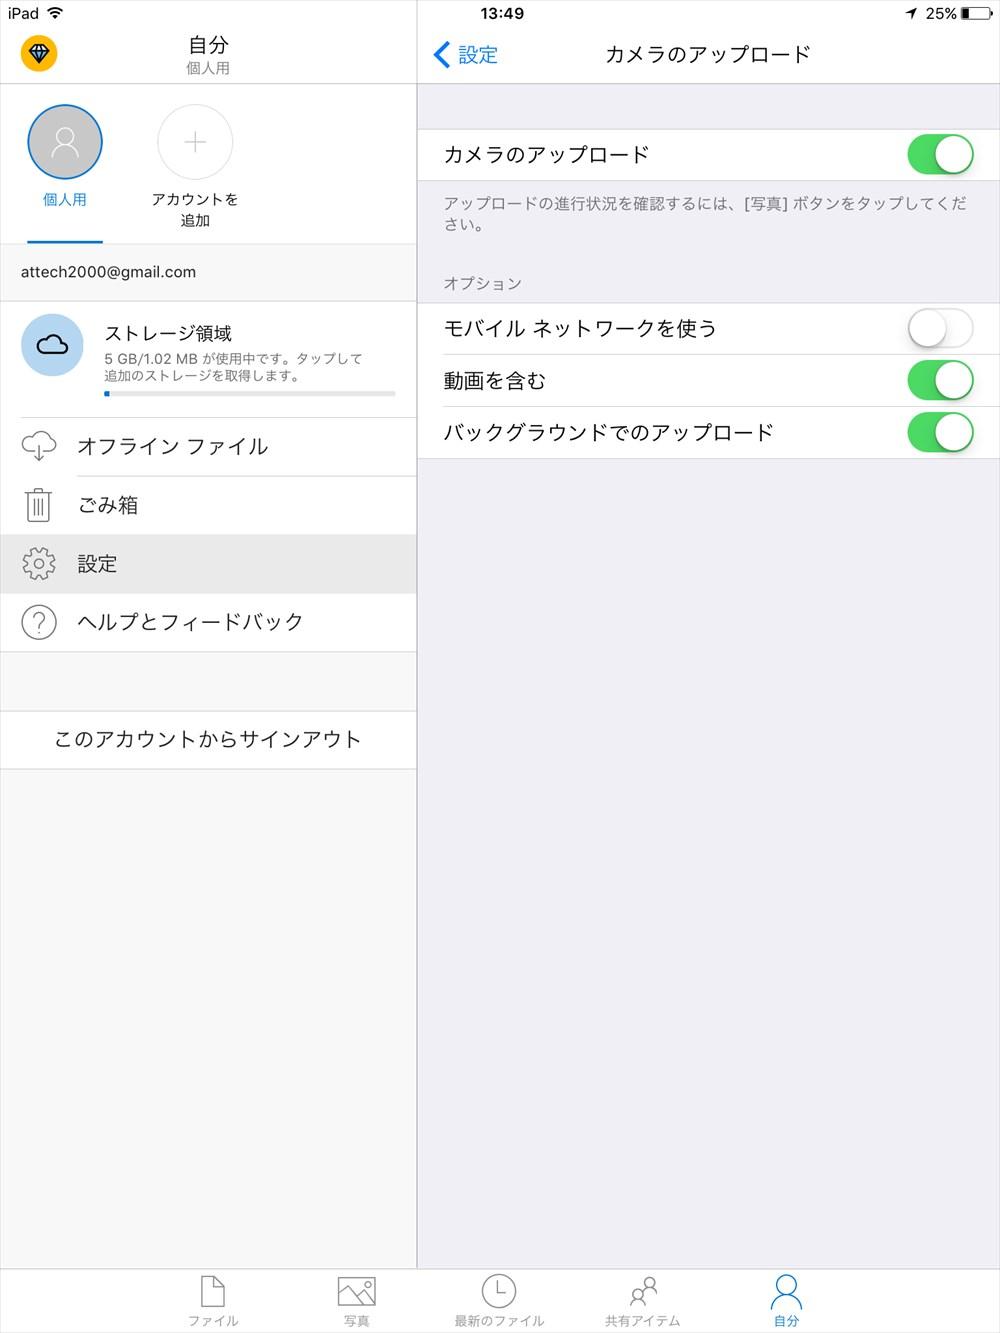 iPad_OneDrive_自分_設定_カメラのアップロード